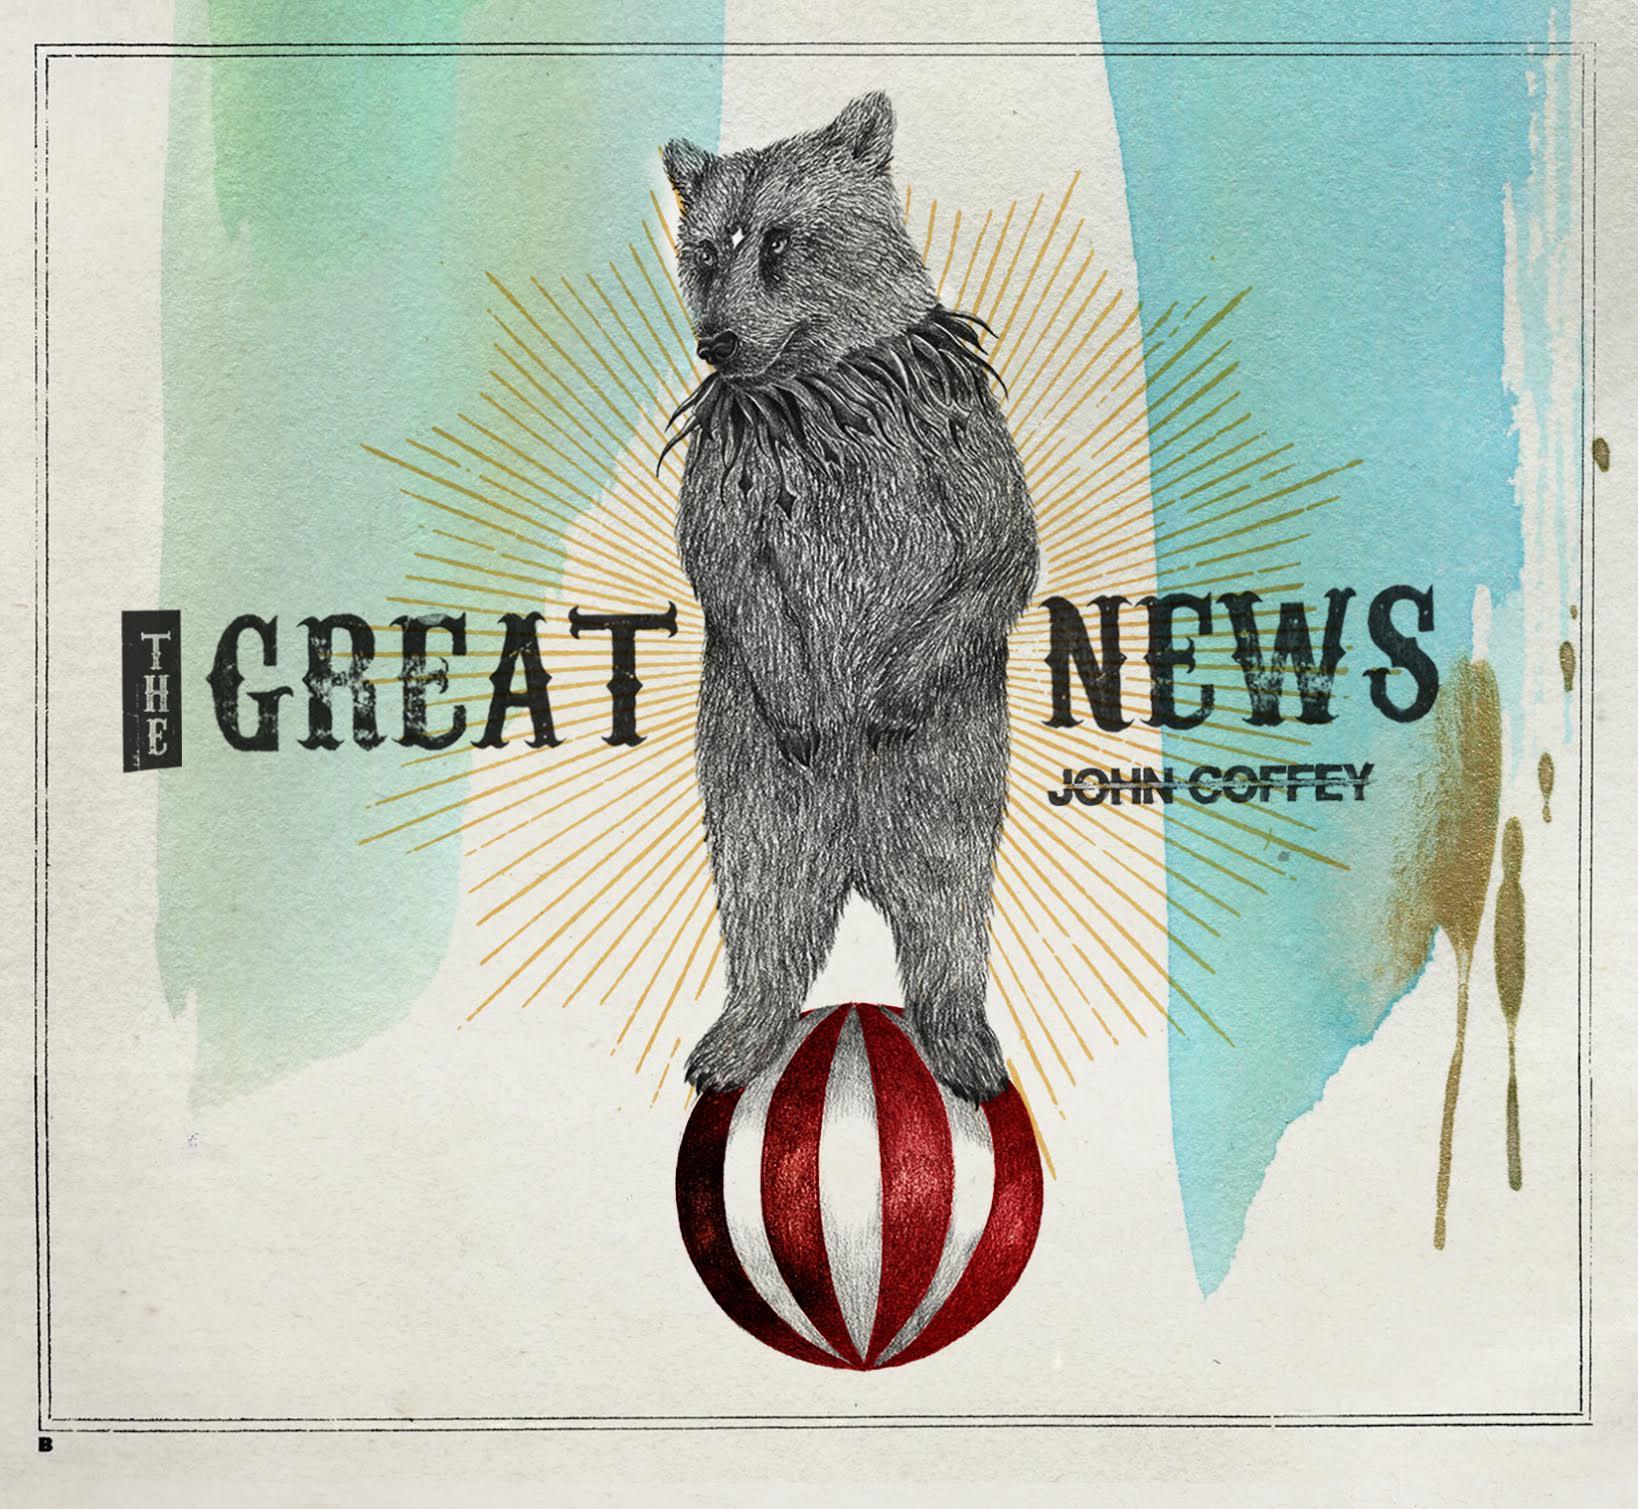 Die neuen Metal-Alben im Januar 2015 - John Coffey THE GREAT NEWS